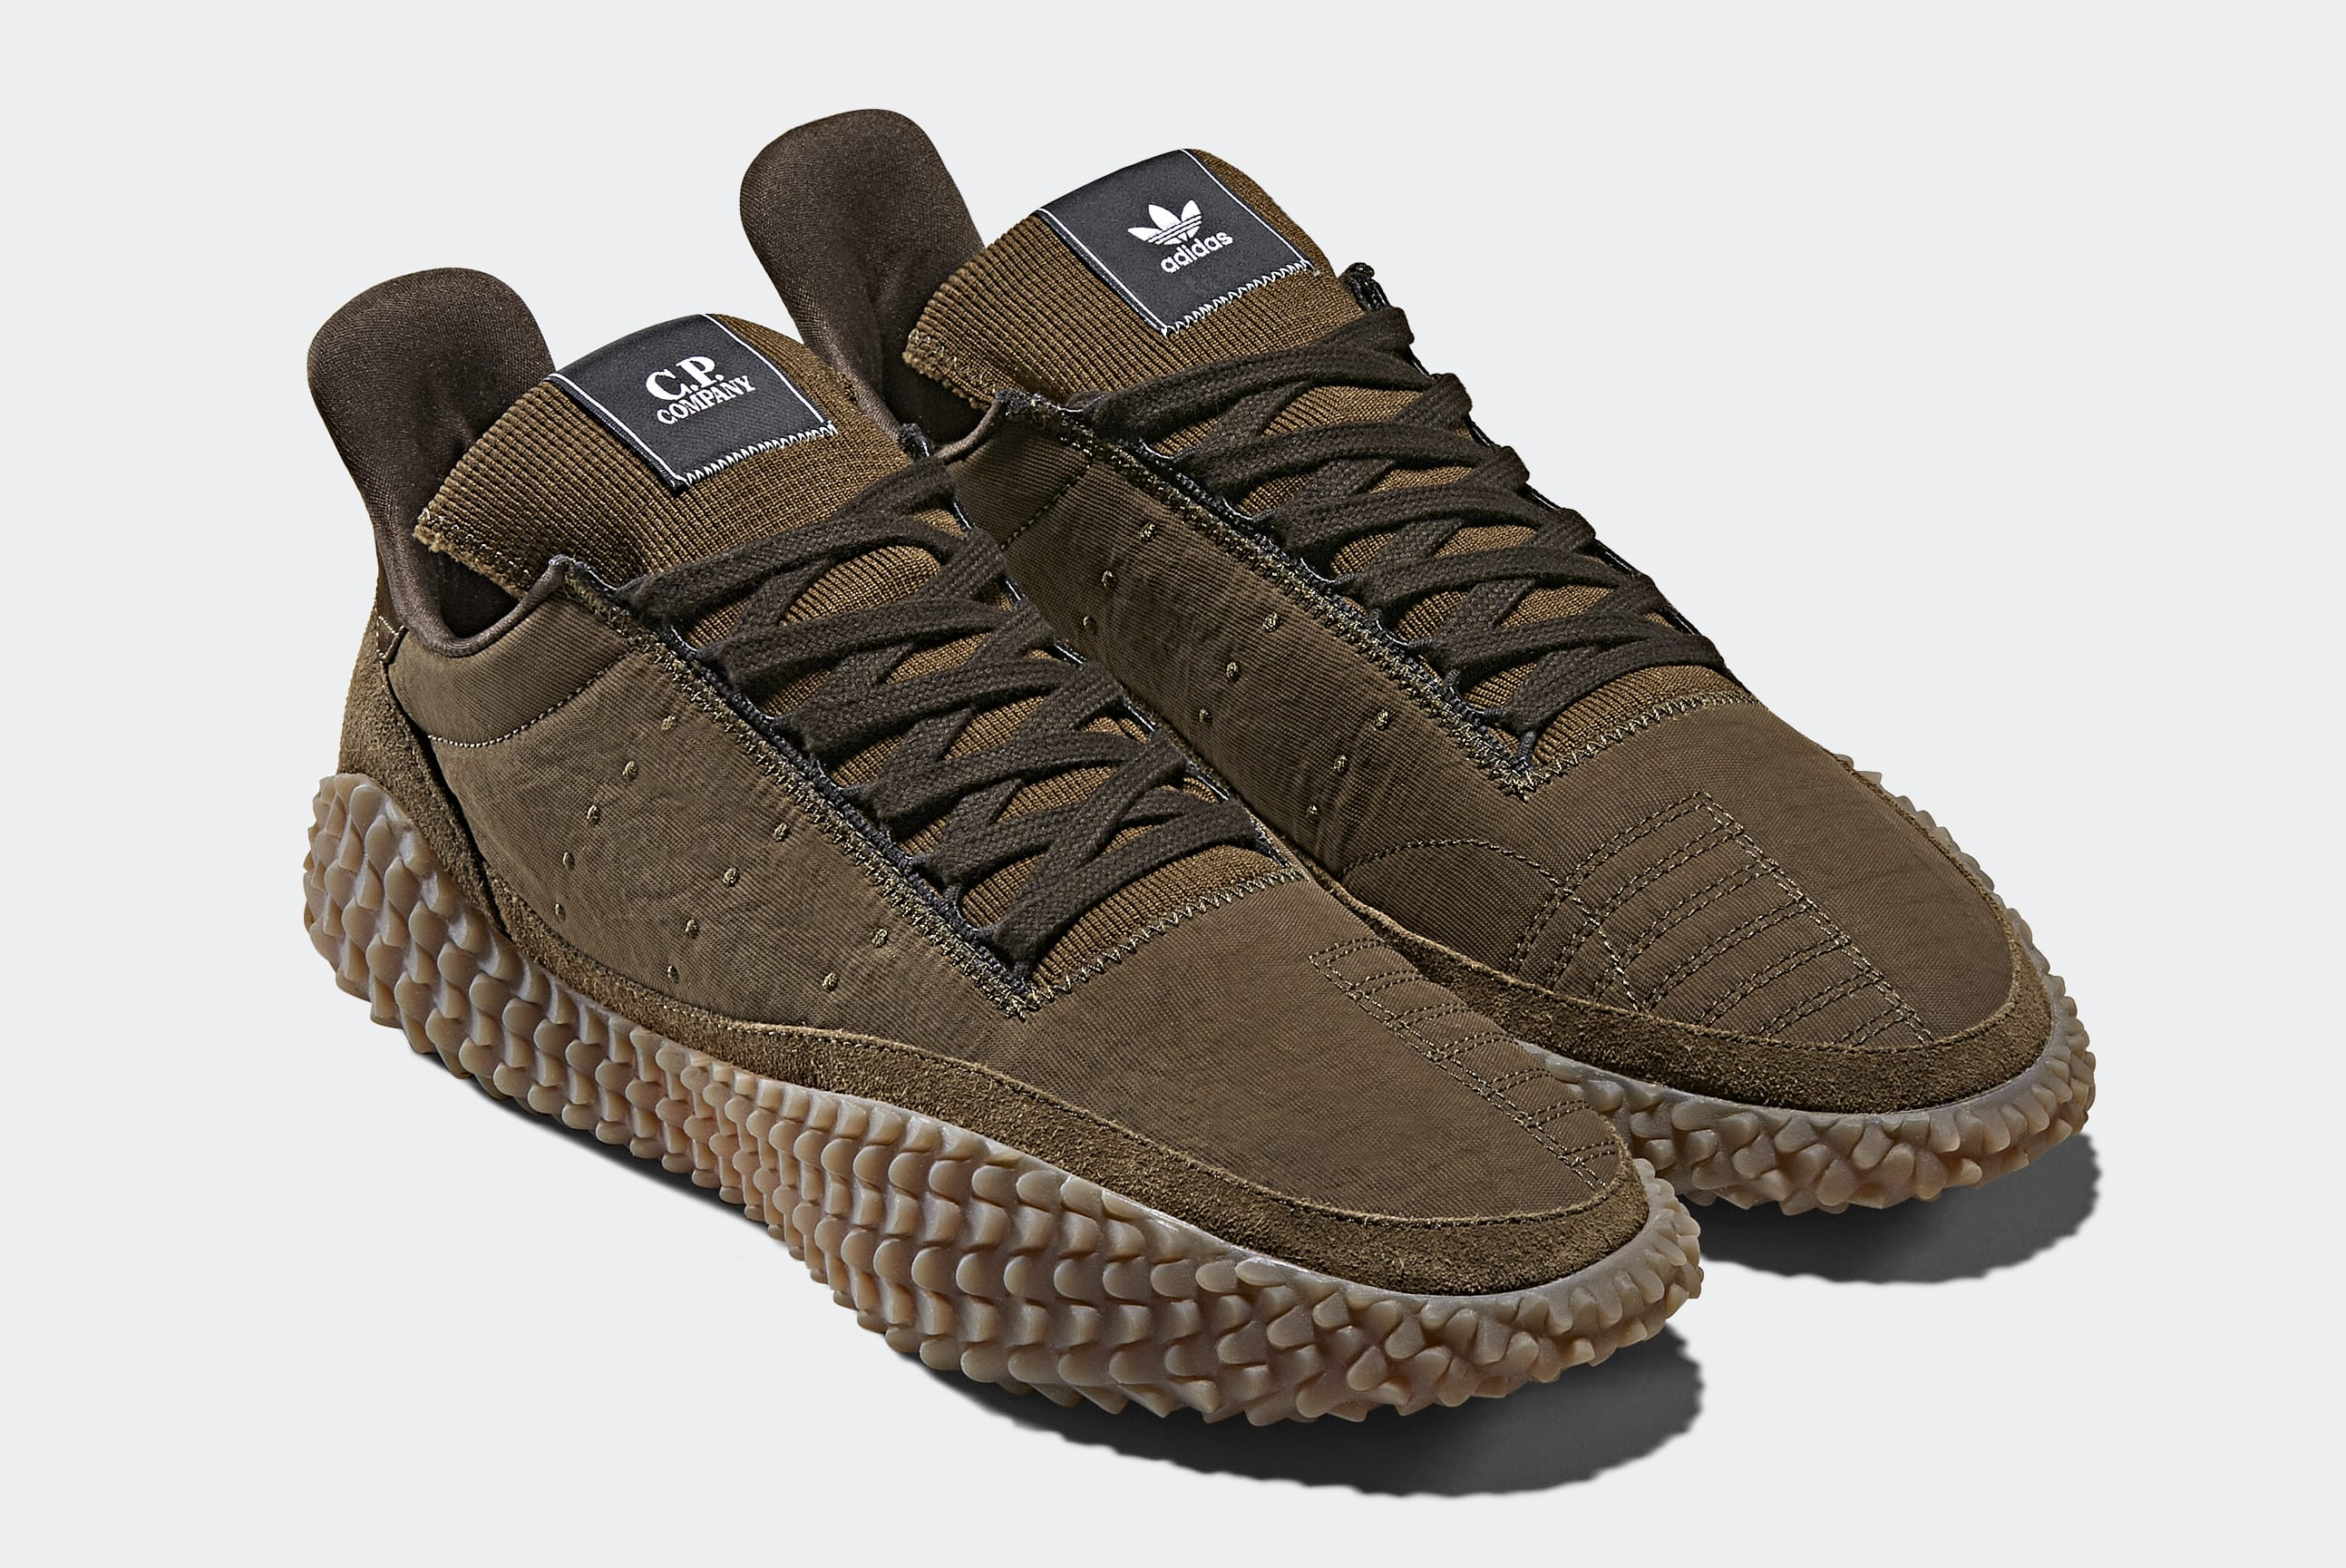 Adidas x C.P. Company Kamanda 'Brown' CG5952